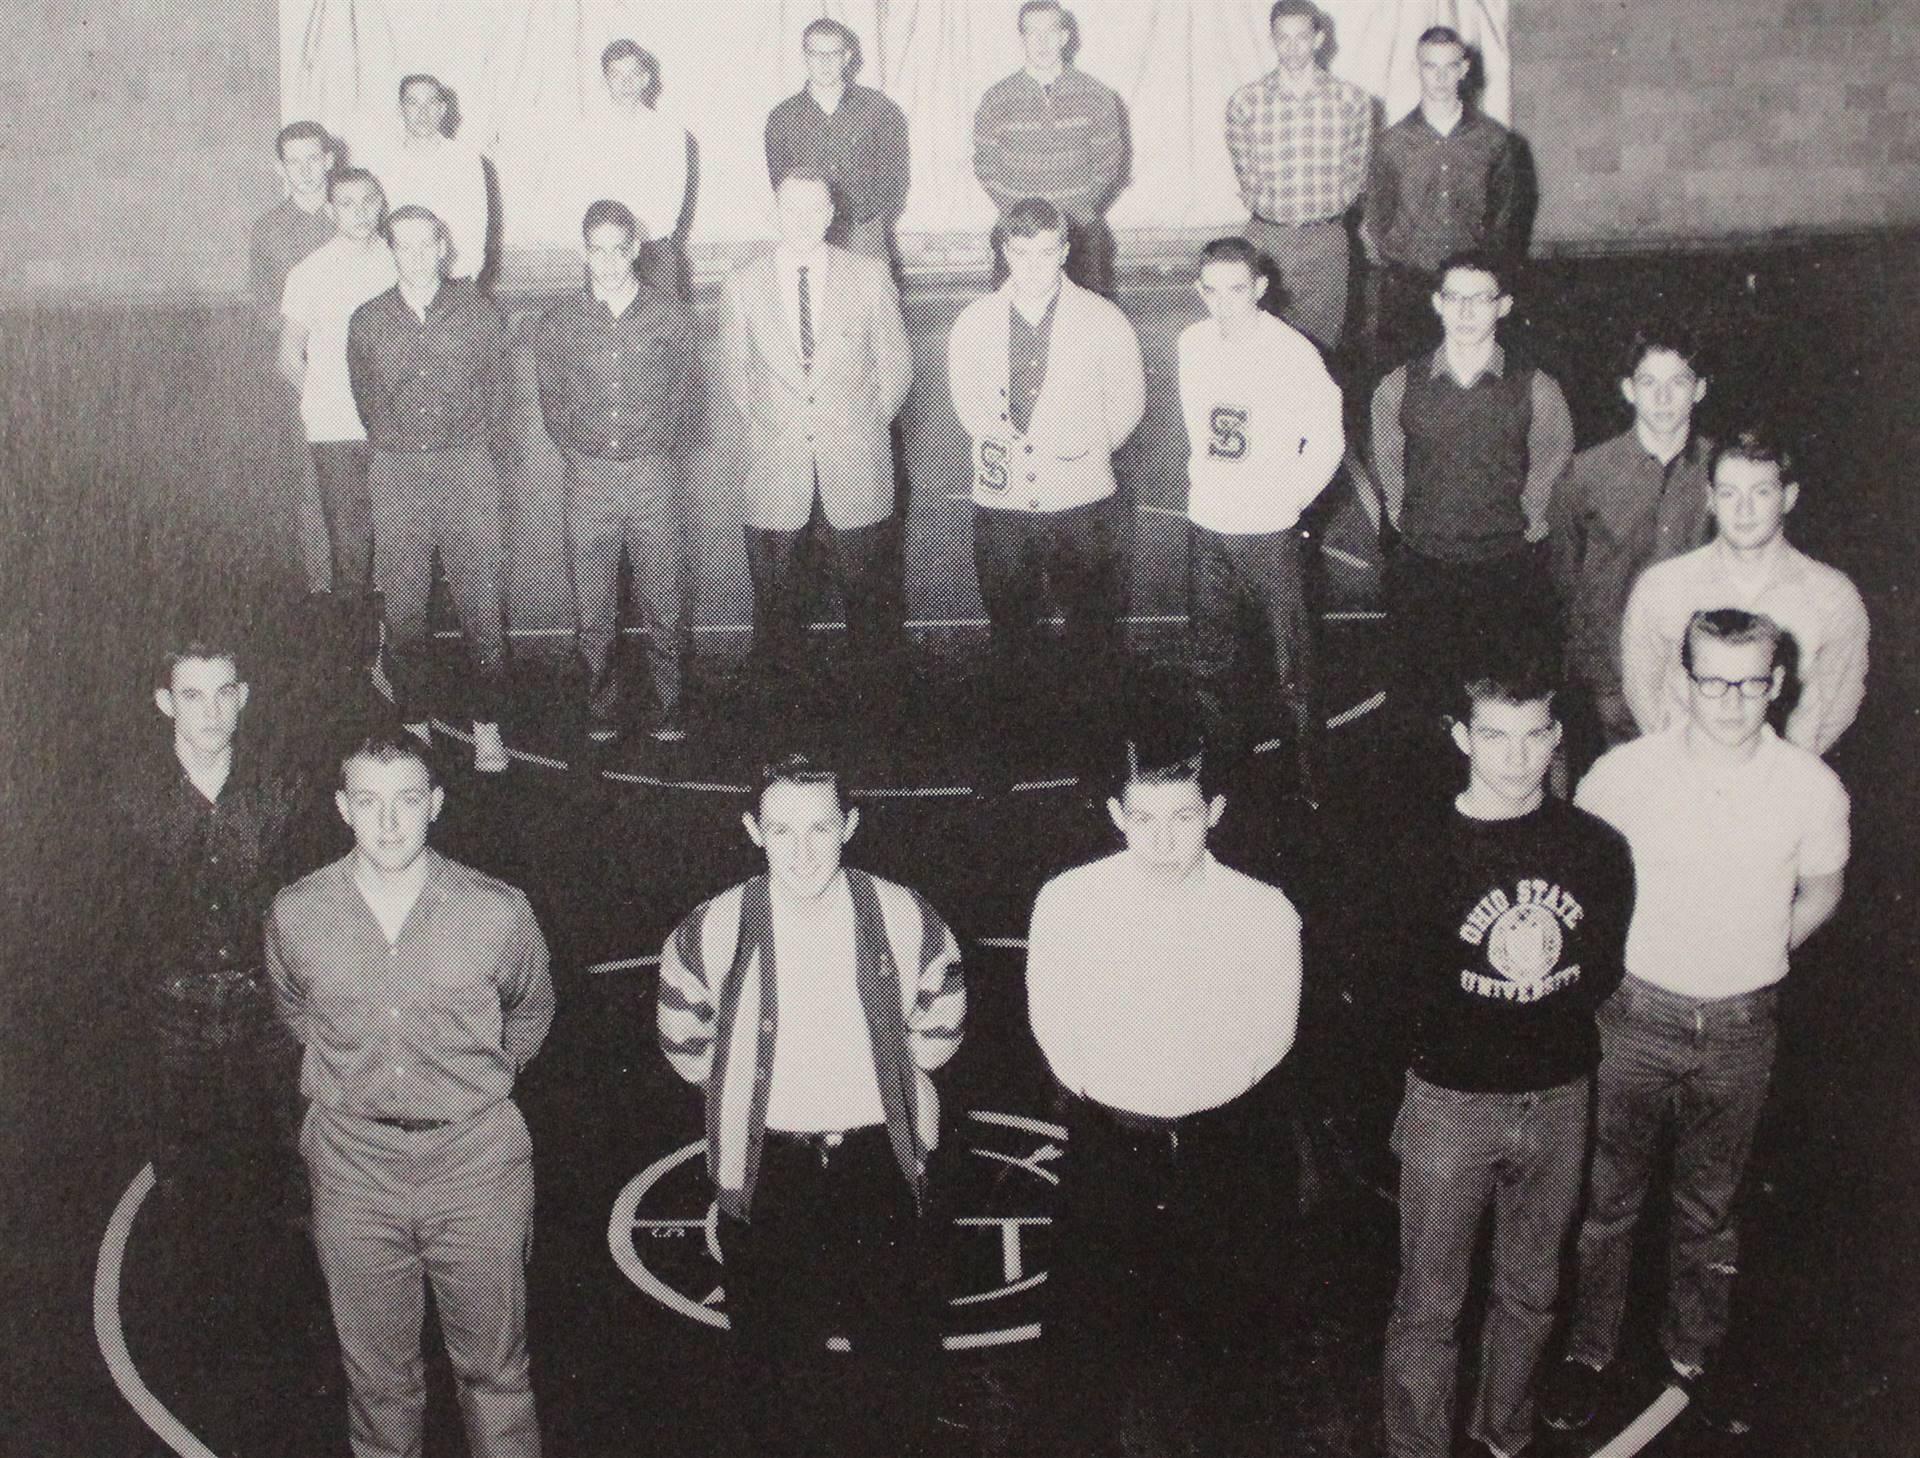 1963 Letterman's Club